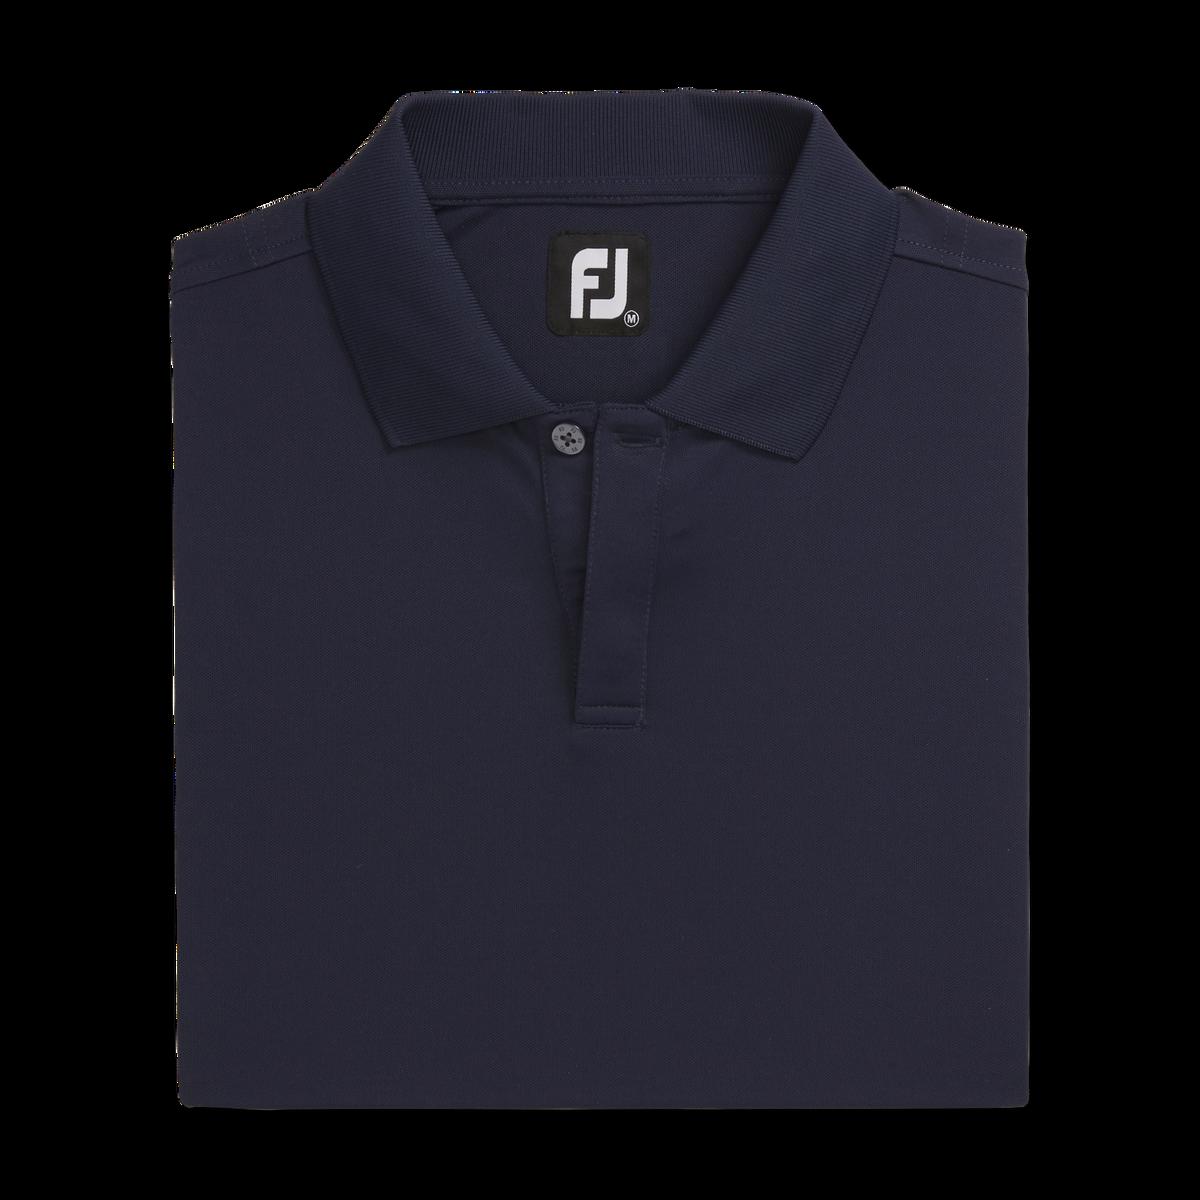 Pique Block Sleeve Knit Collar